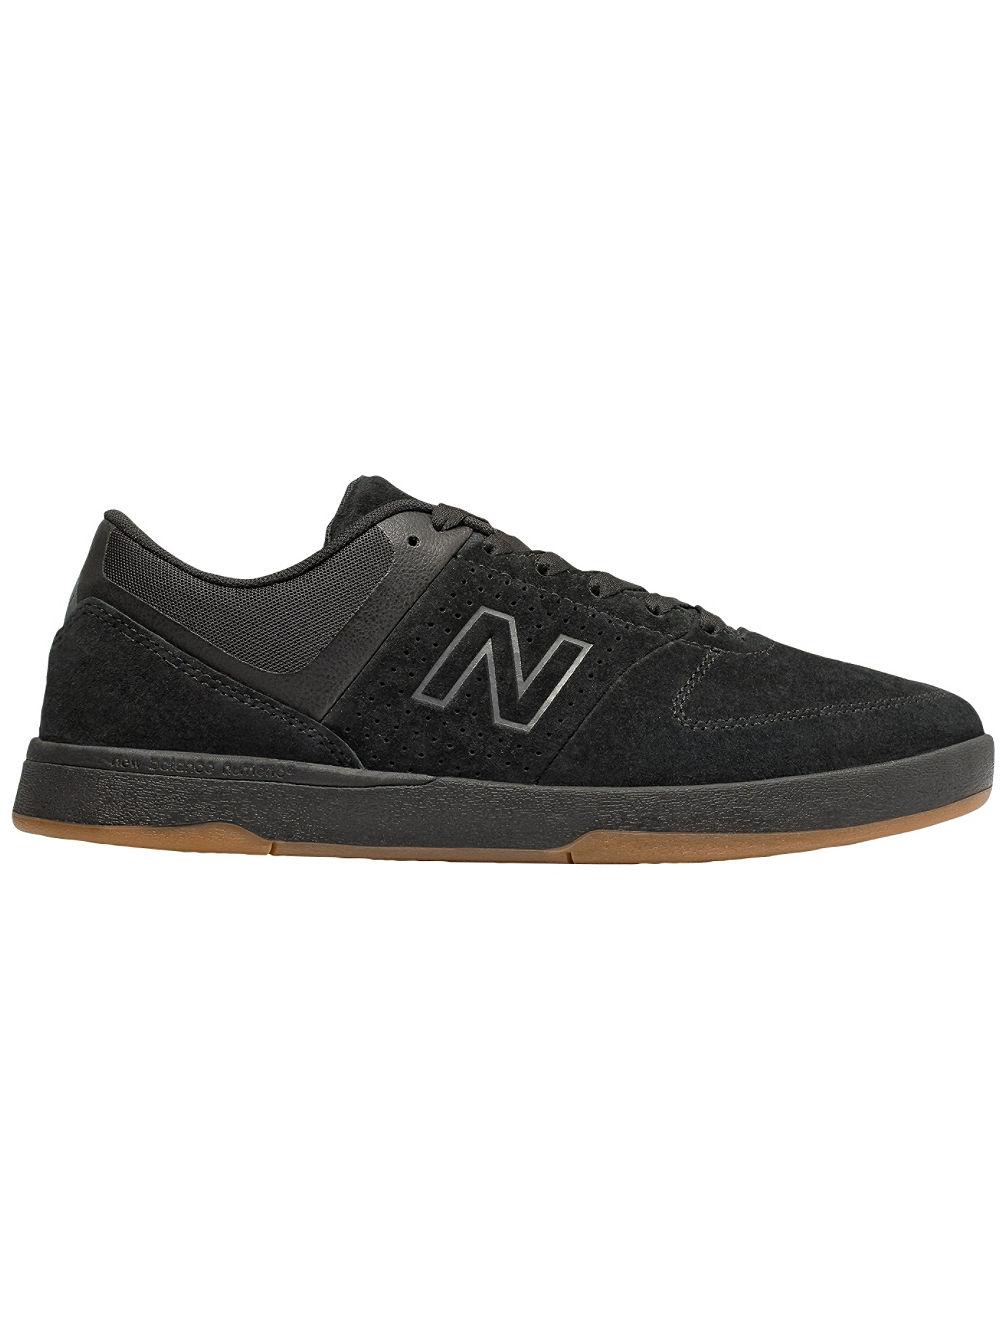 ef0ba36975697 Buy New Balance 533 Numeric Skate Shoes online at Blue Tomato